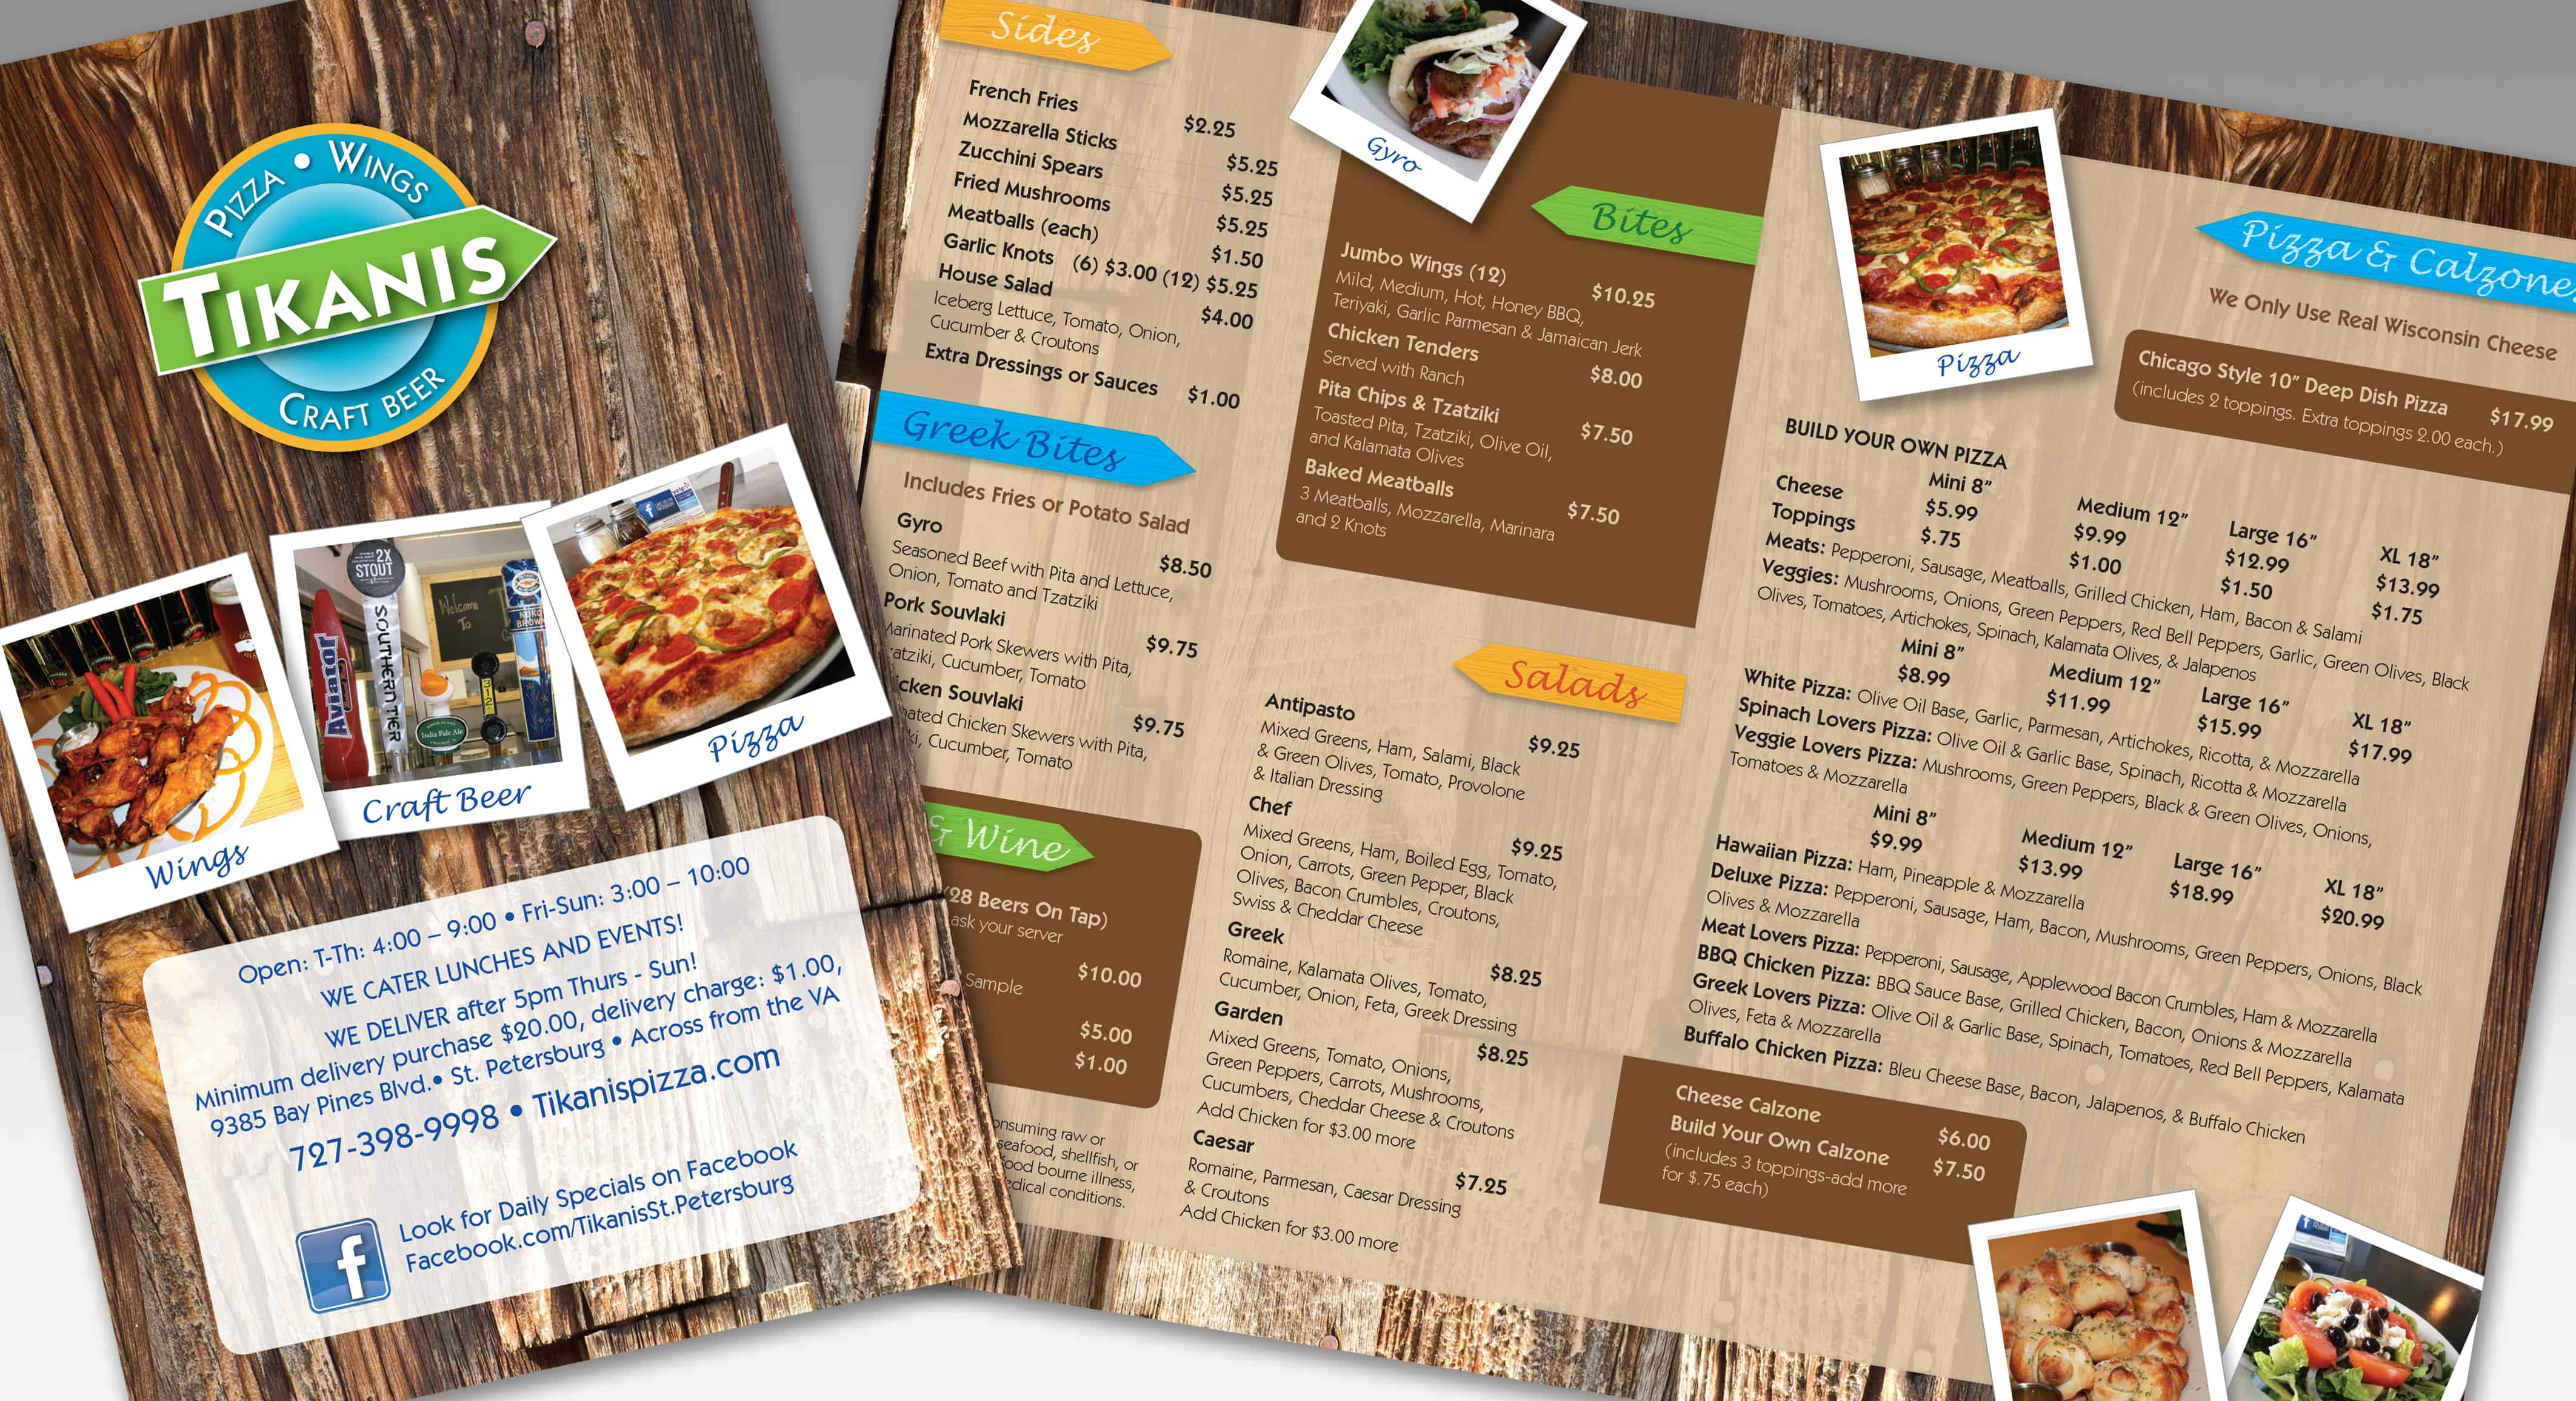 Tikanis Restaurant